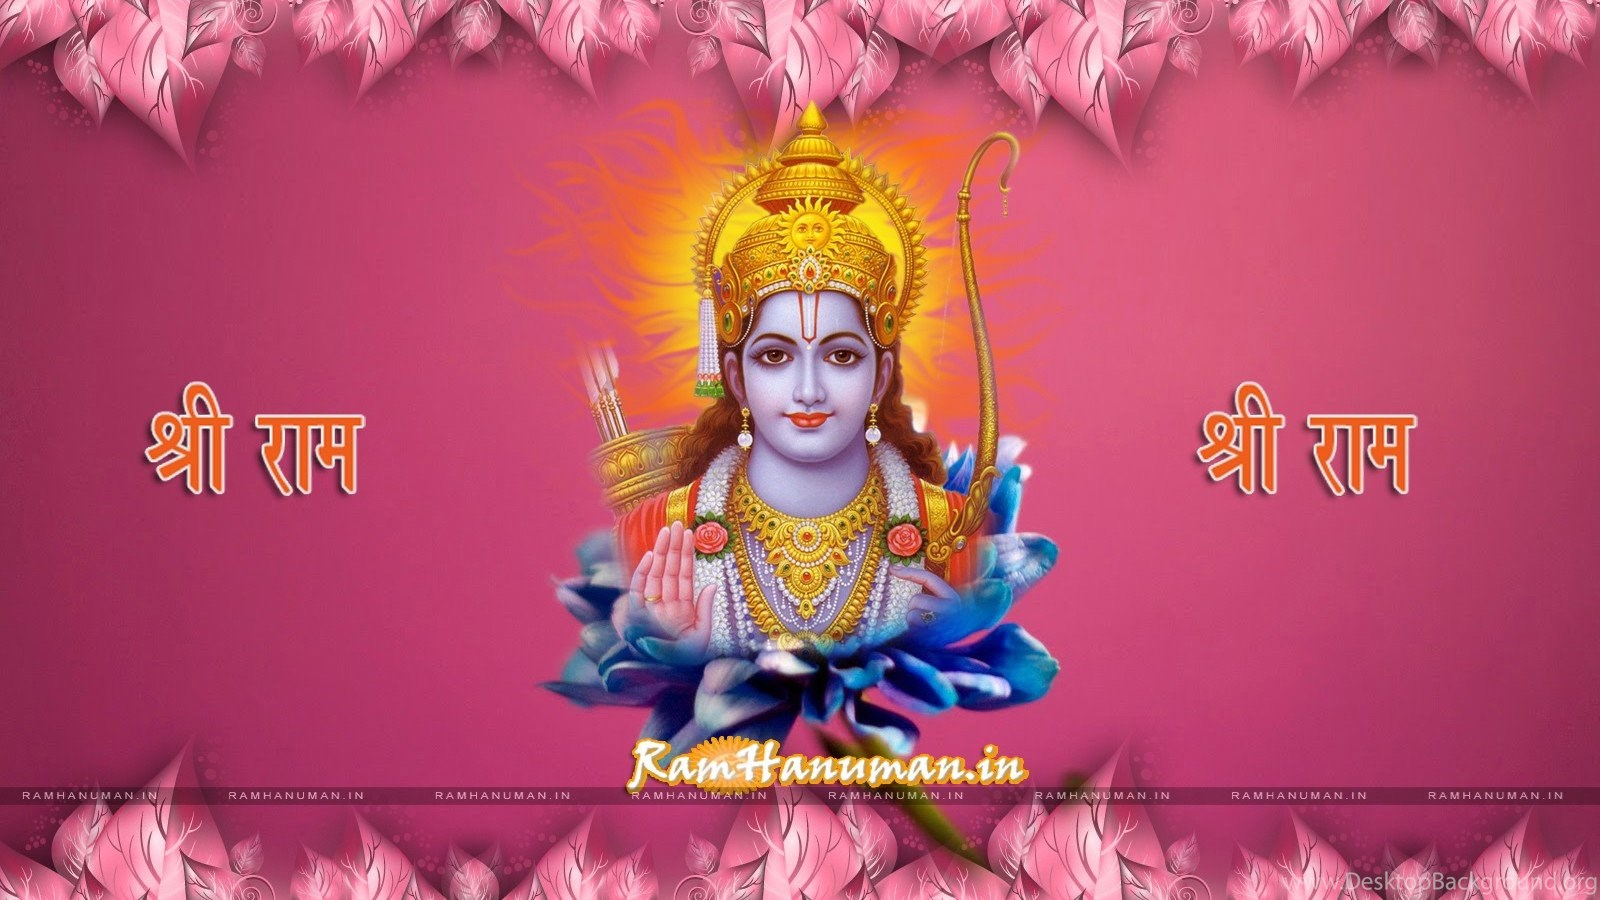 Best Hd Wallpapers Lord Shri Ram Full Wallpaper Hd 1418443366jpg